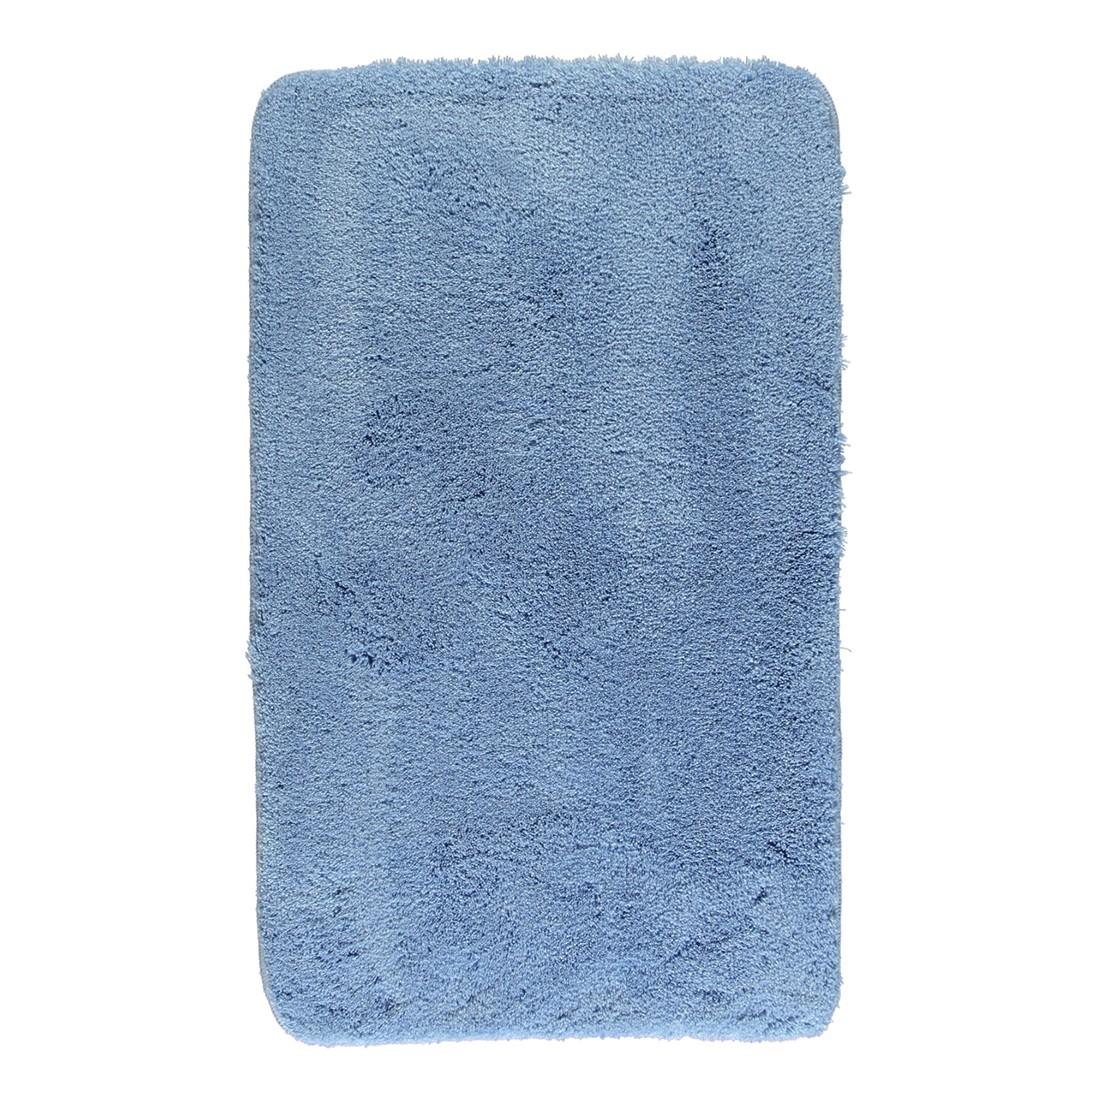 Badteppich Relax - 100% Polyacryl Azur - 723 - 50 x 80 cm, Kleine Wolke